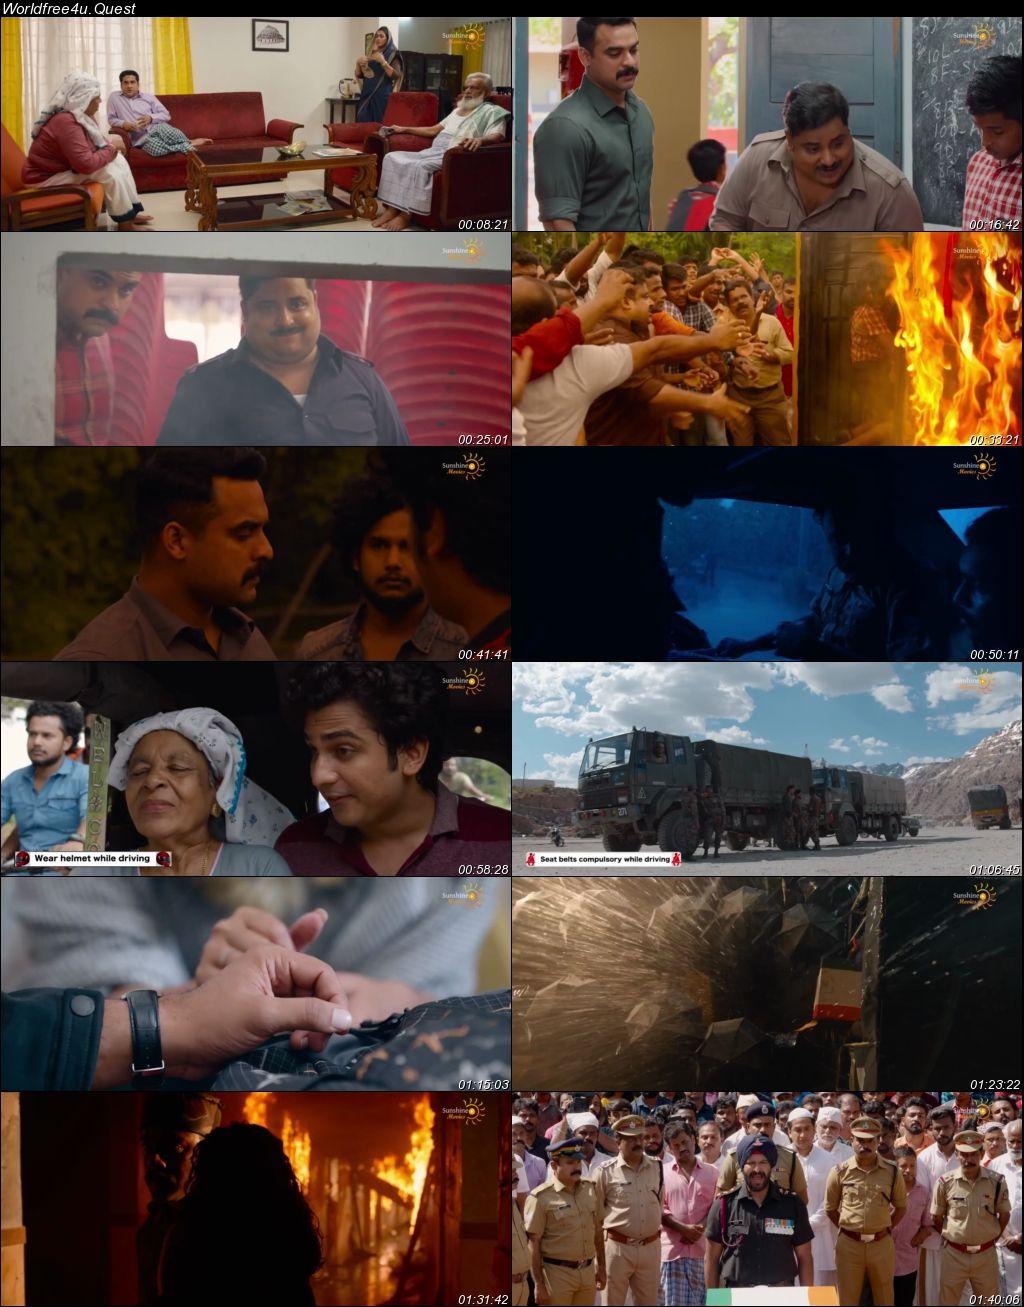 Edakkad Battalion 06 2019 Hindi Dubbed Movie Download    HDRip 1080p    720p    480p